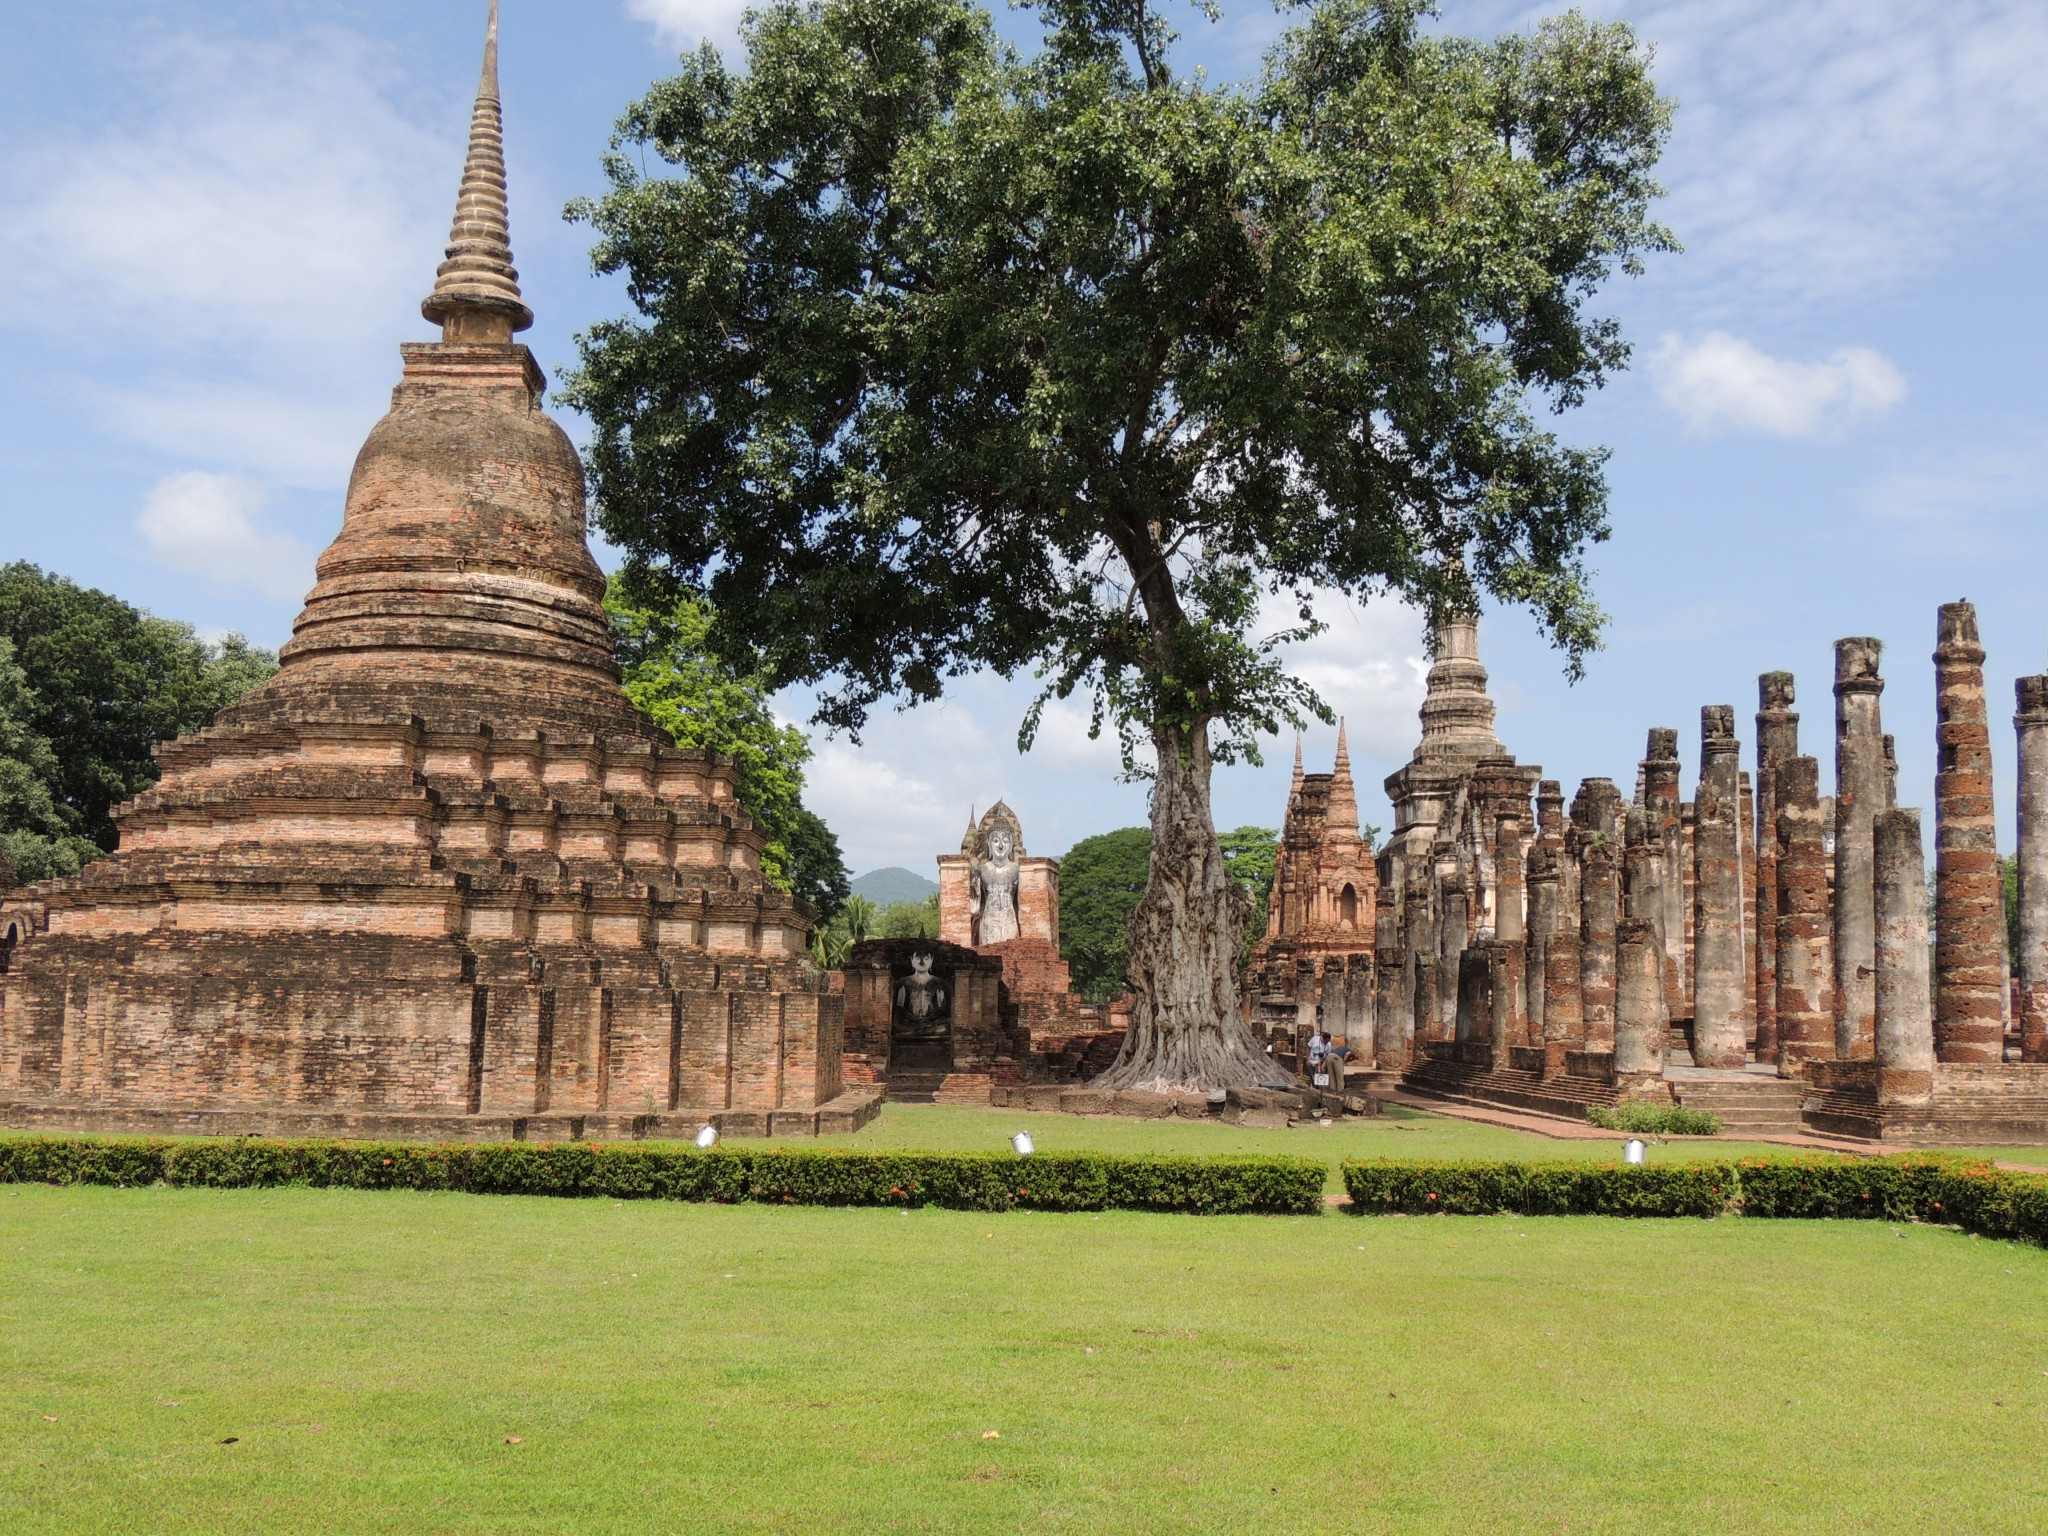 Thailand, Phitsanuloke - Wat Phra Sri Rattana Mahathat